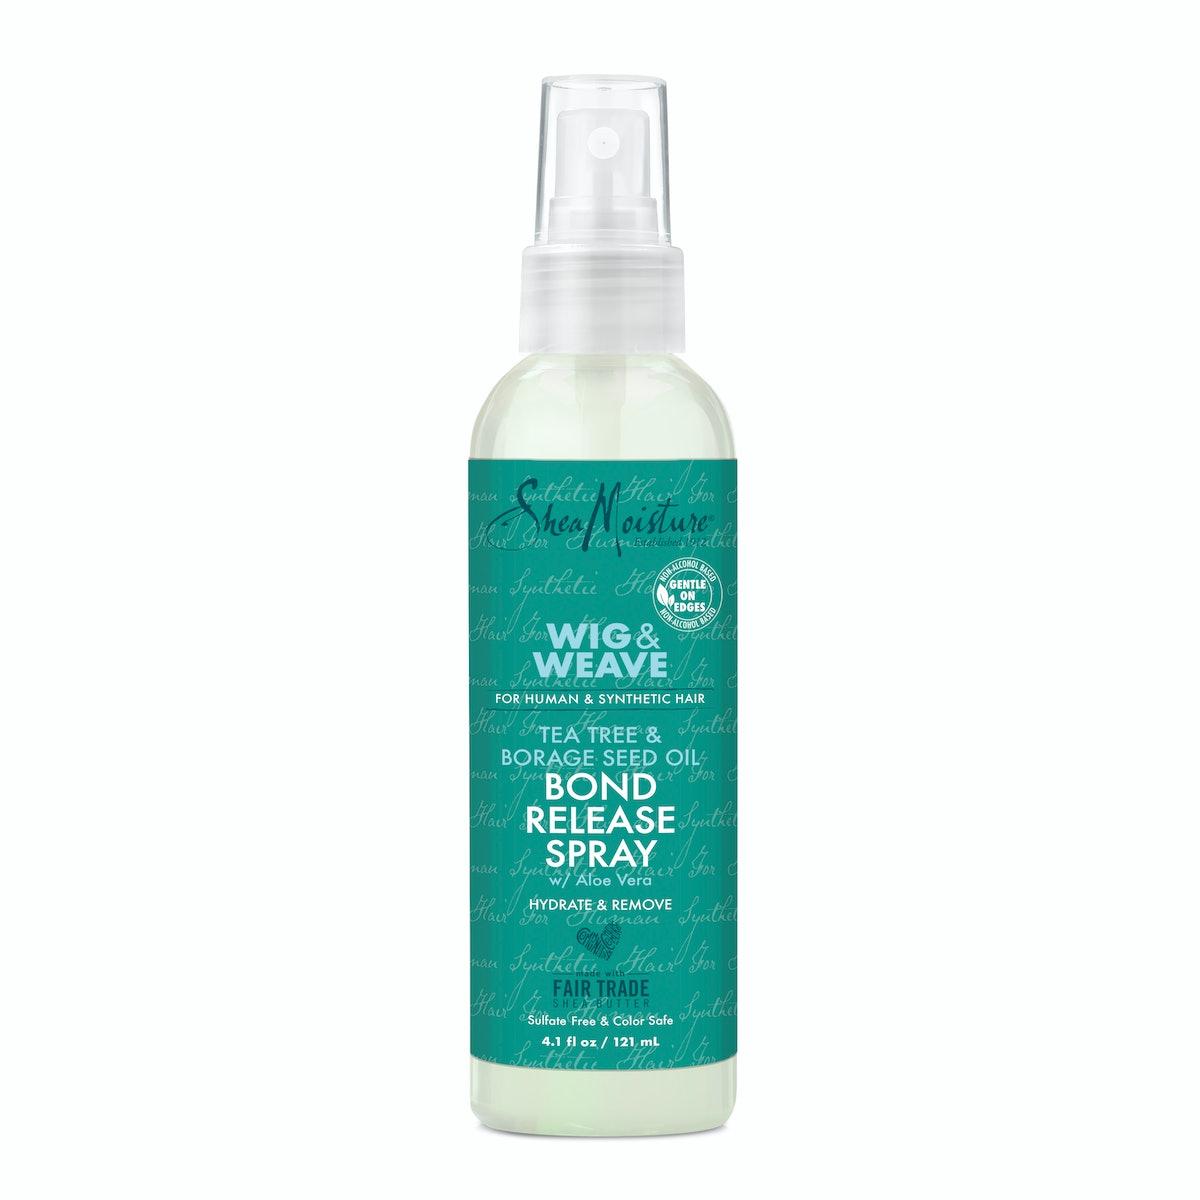 Wig & Weave Bond Release Spray